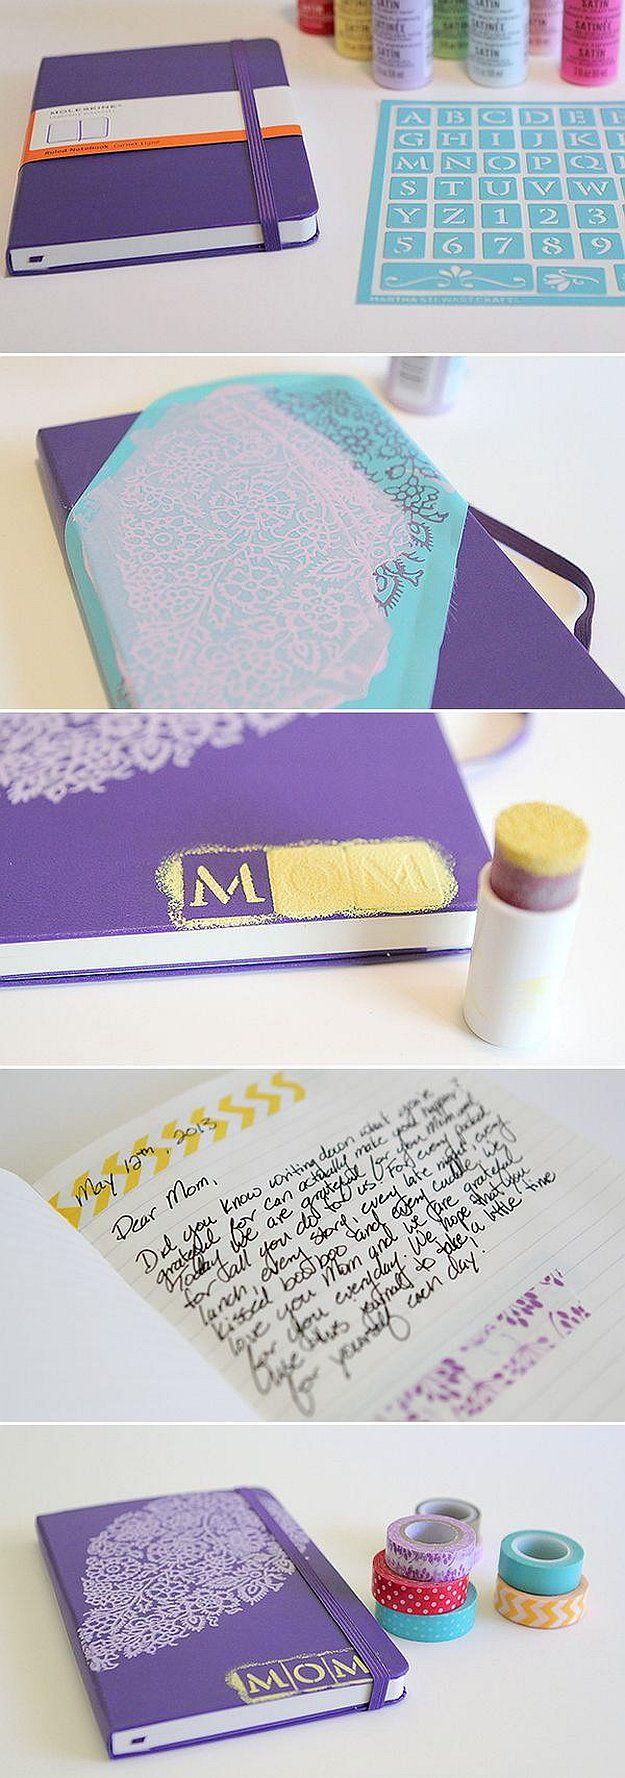 Birthday Gift Ideas for Mom                              …